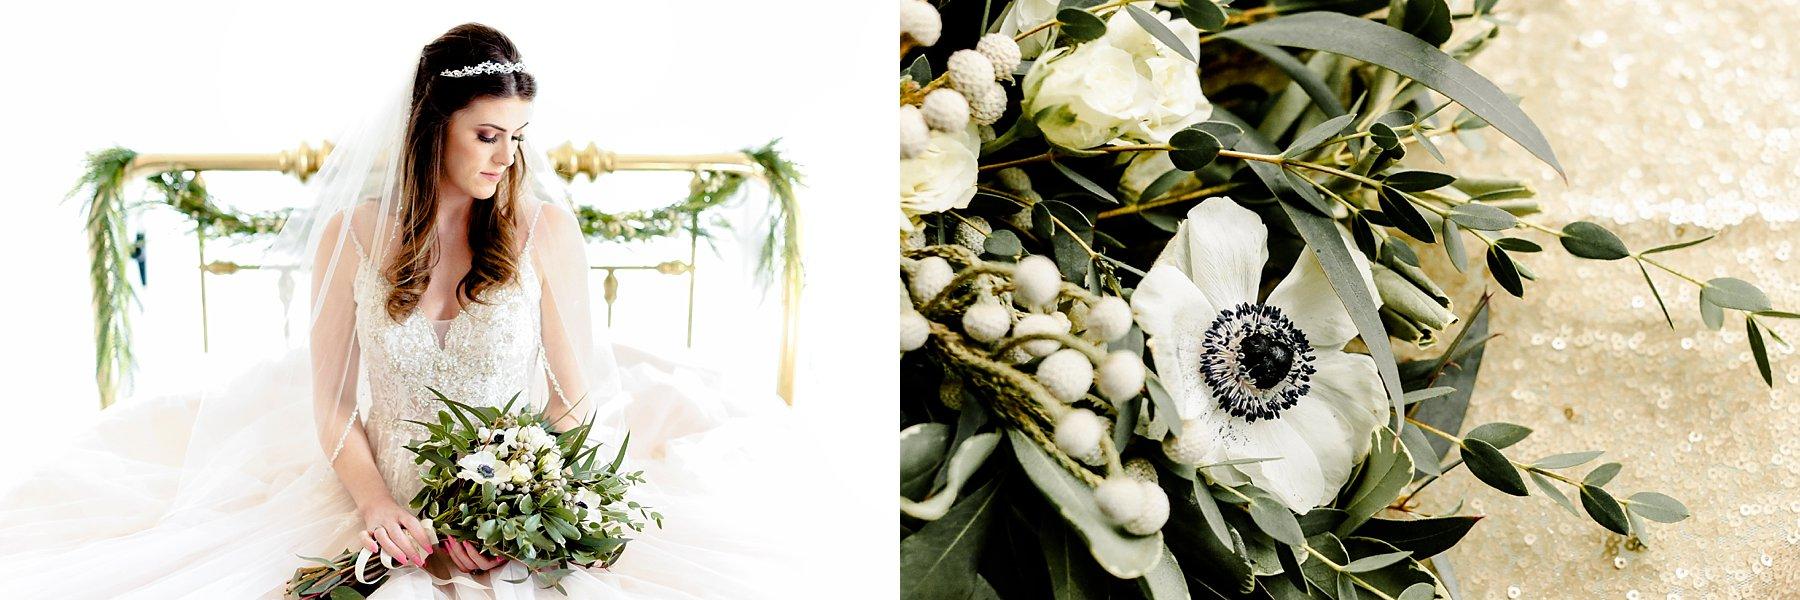 photographer_wedding_saint_louis_Kansas_City_Photography_Videography_workshop_training_styled_engagement_Lake_Ozark_KC_MO_STL_Rolla_Hermann_Saint_James_0437.jpg